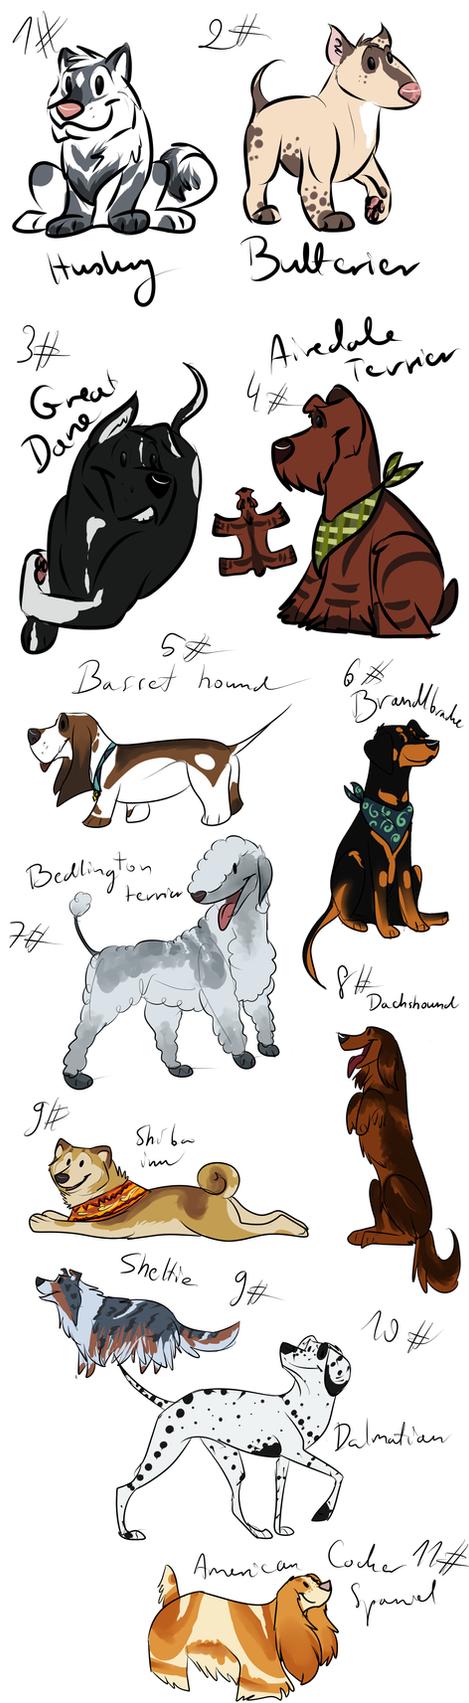 Dogs Adoptions by WierkaKita